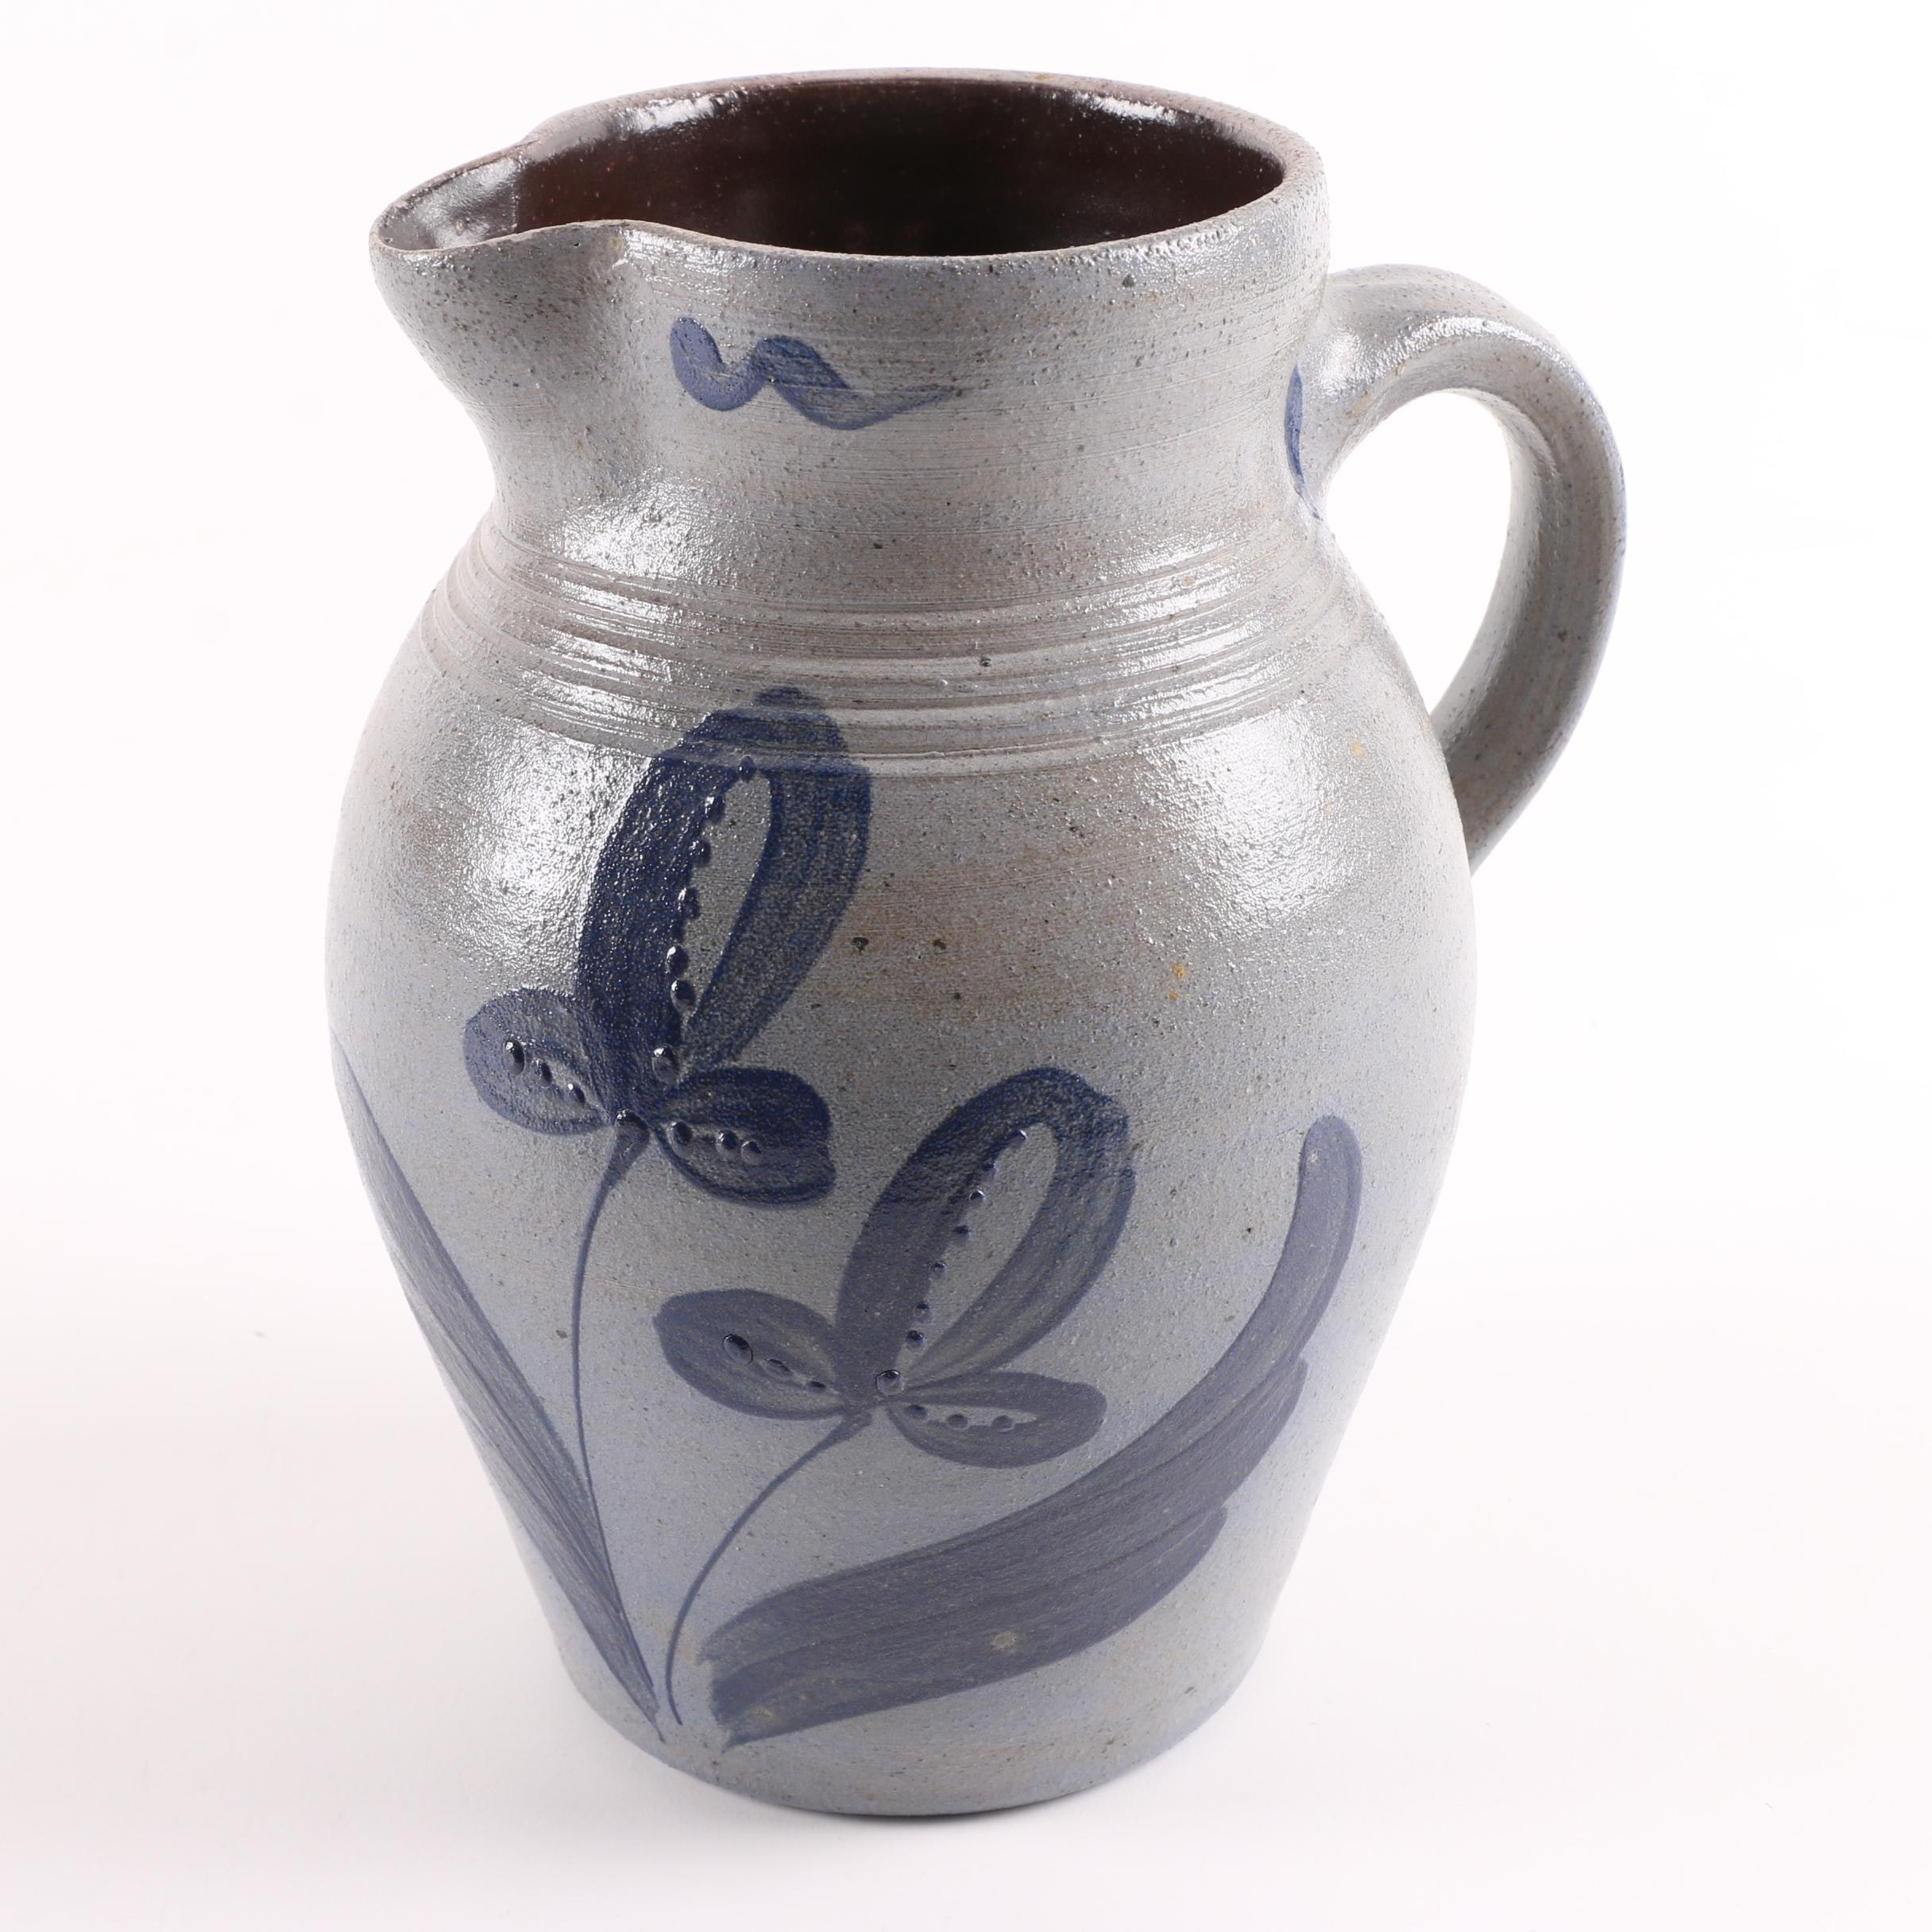 Rockdale Union Hand Thrown Salt Glazed Stoneware Pitcher